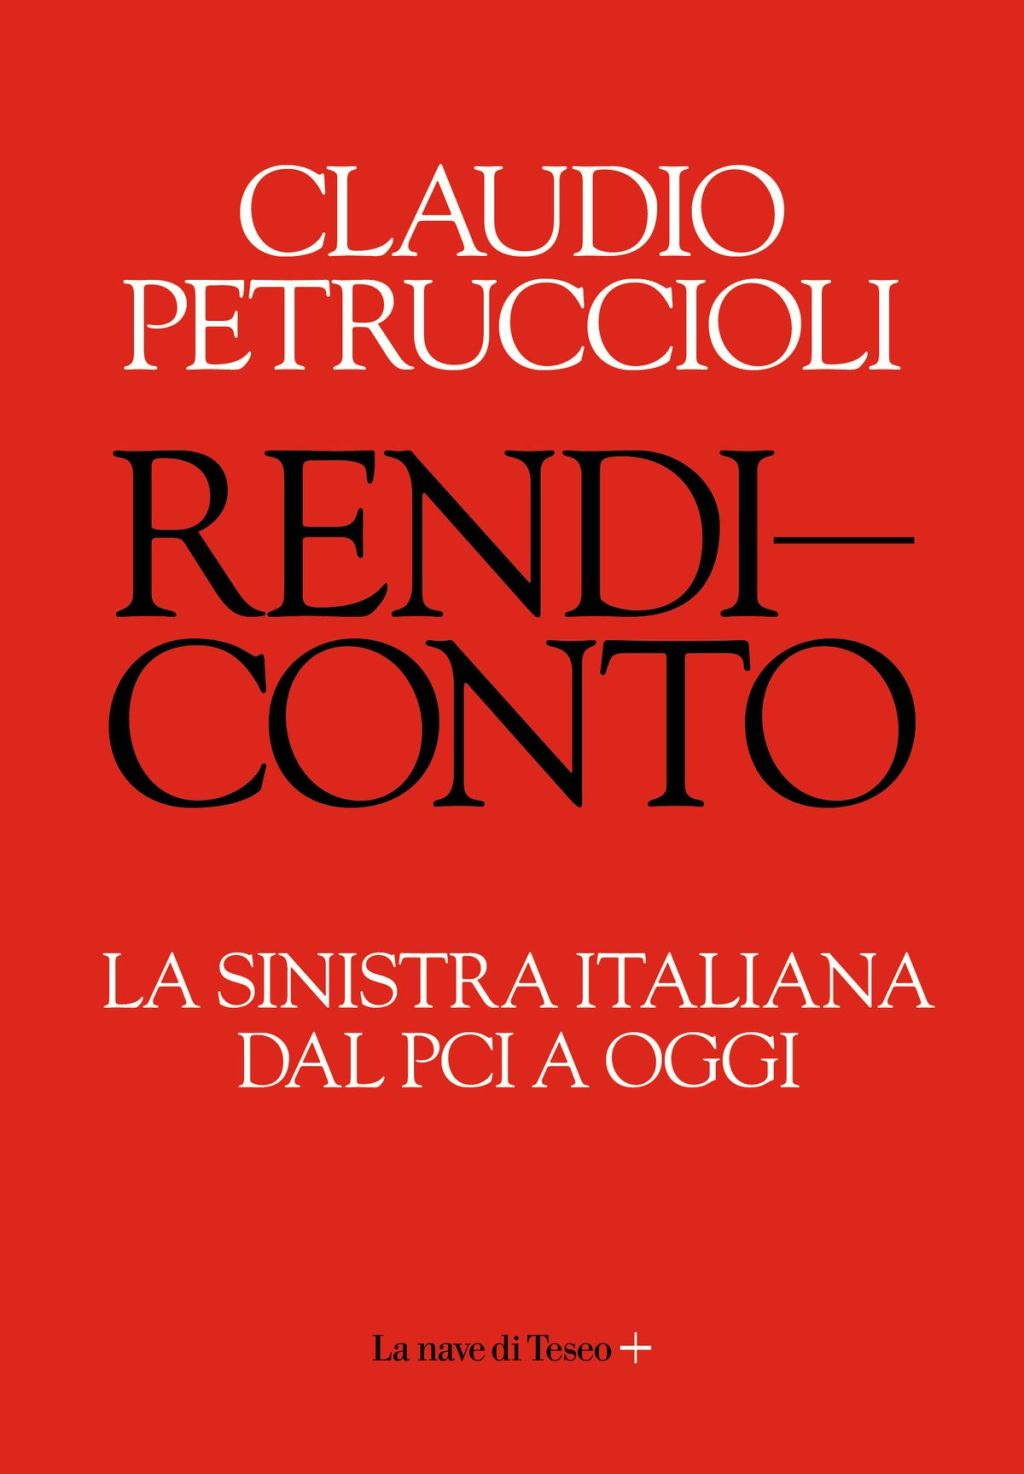 Claudio Petruccioli